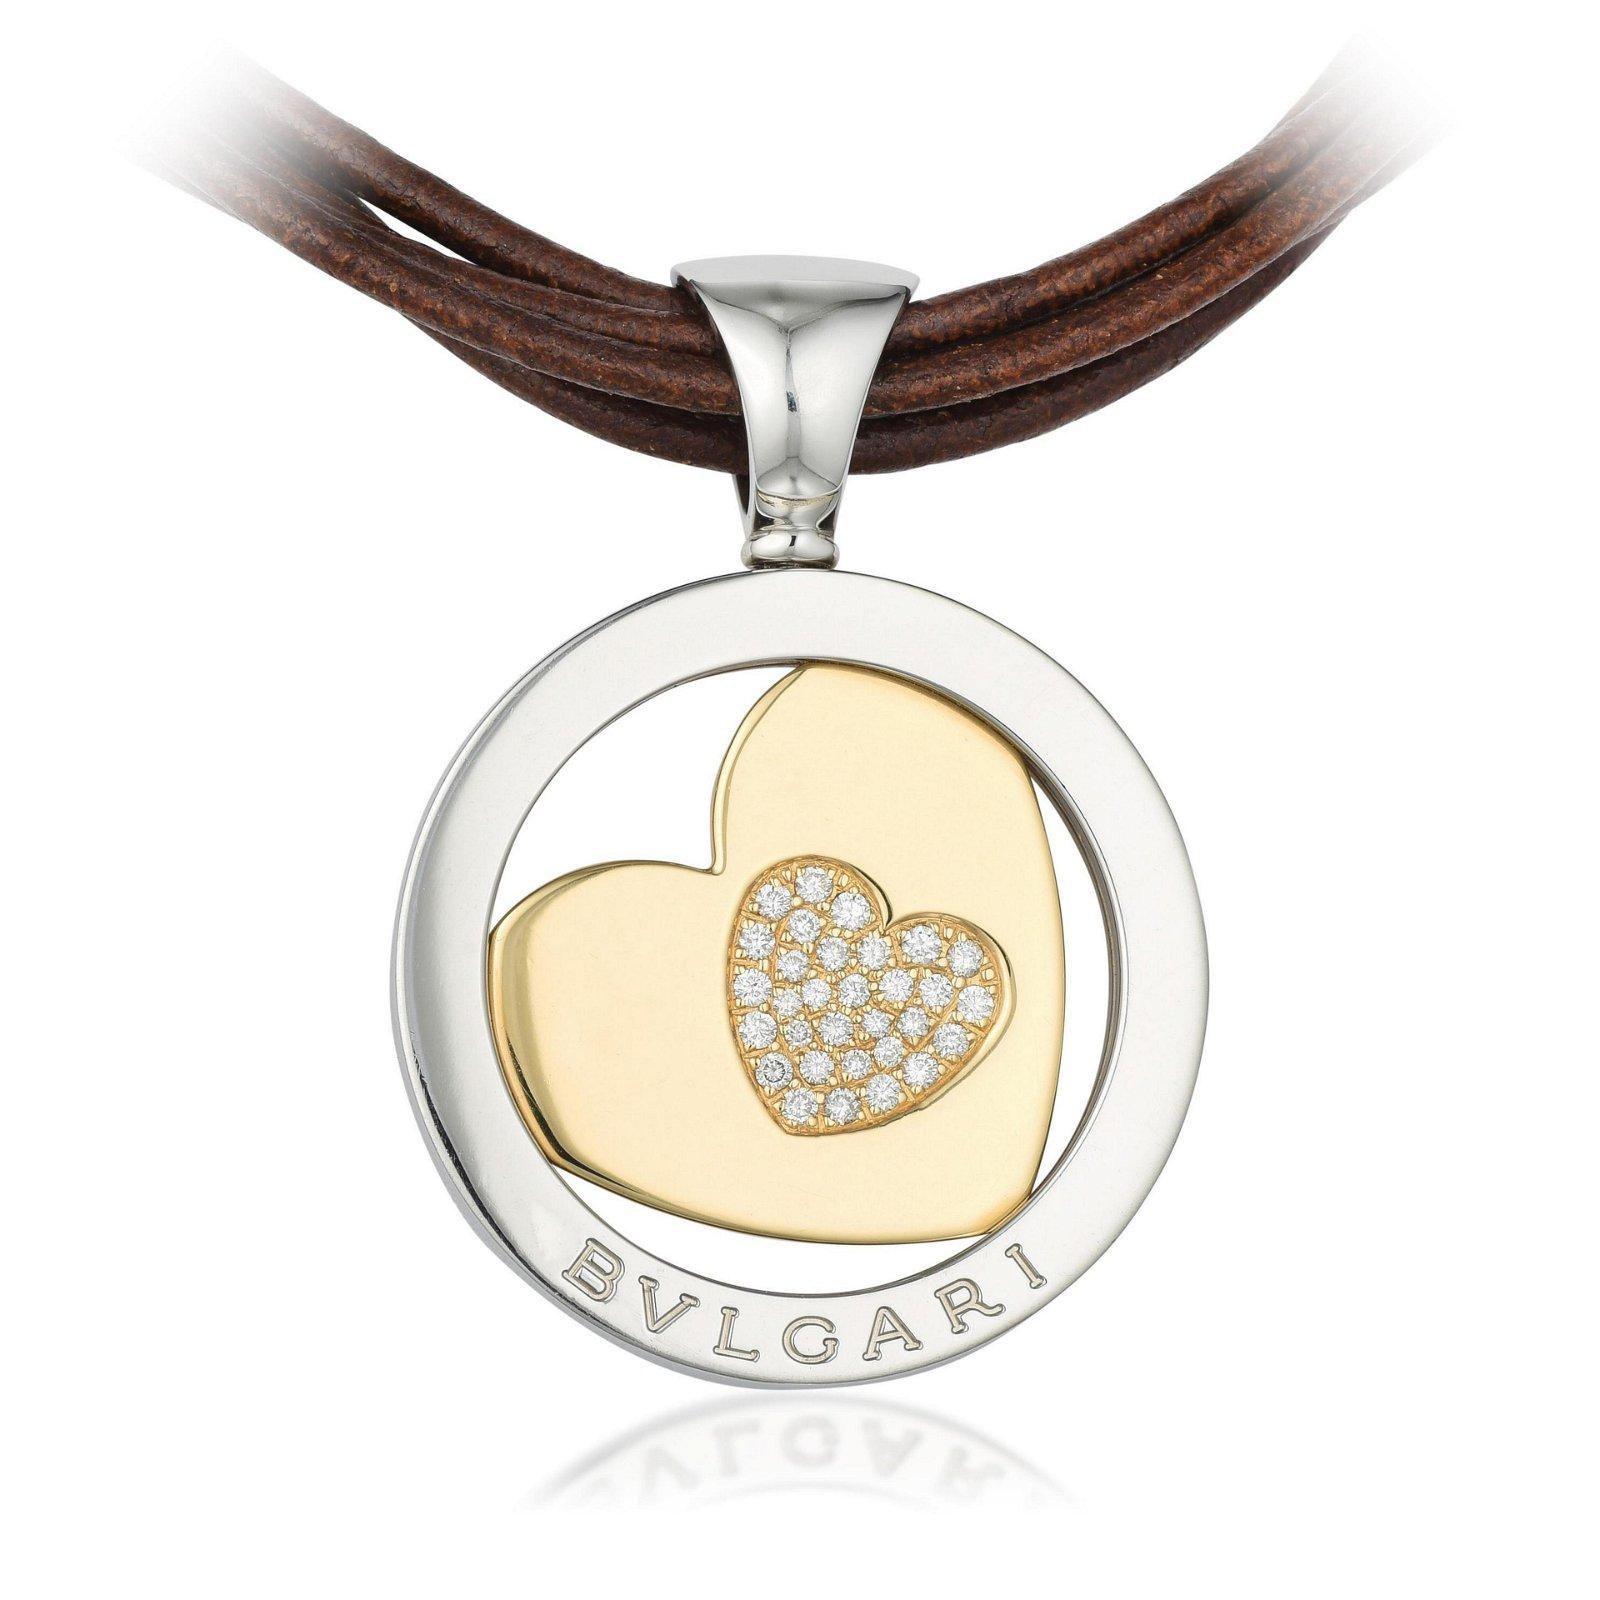 Bulgari Tondo Heart Diamond Pendant on Leather Cord